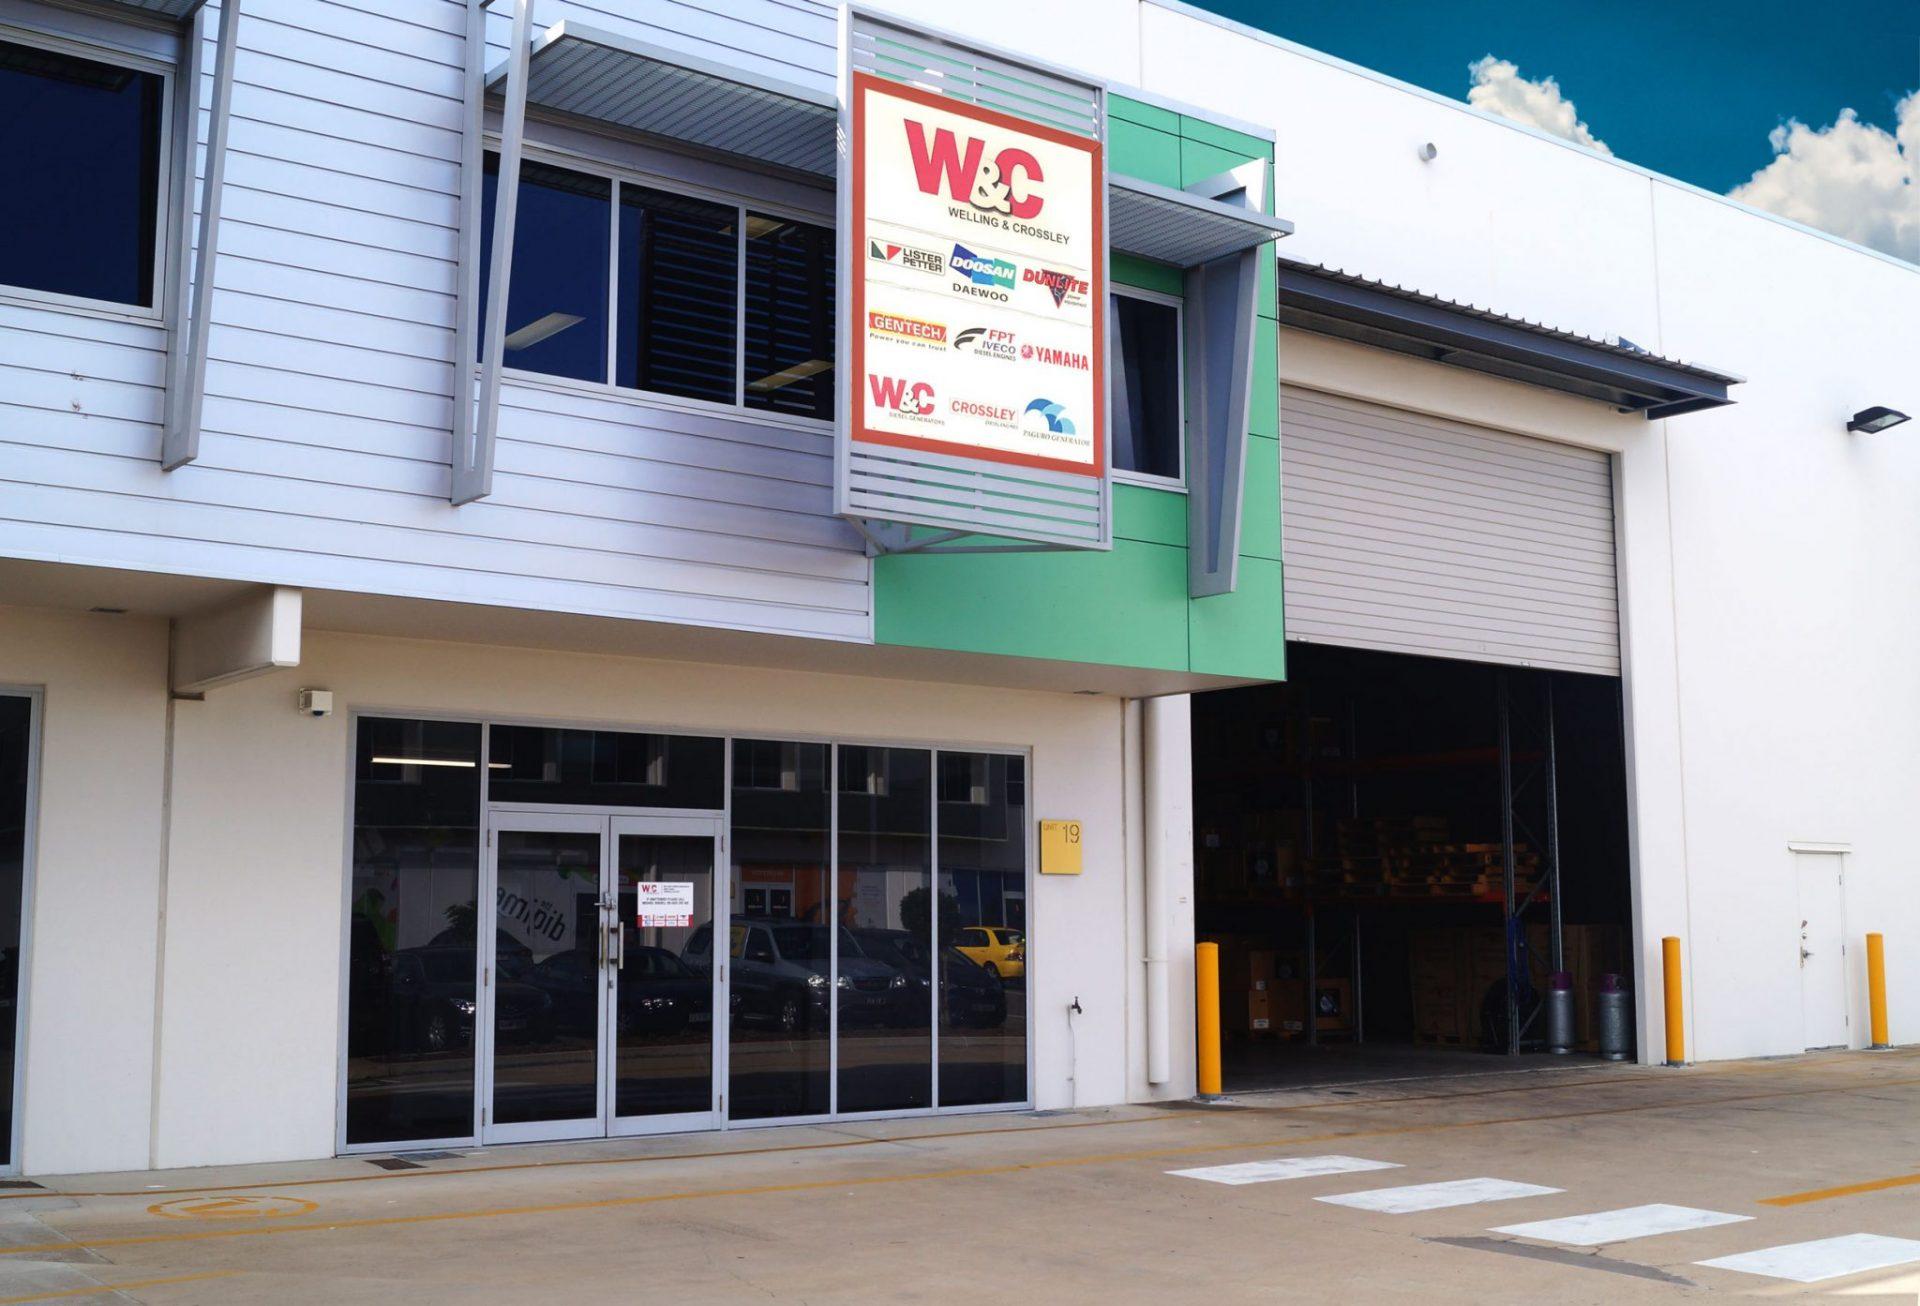 Yamaha Generators office in Townsville, North Queensland